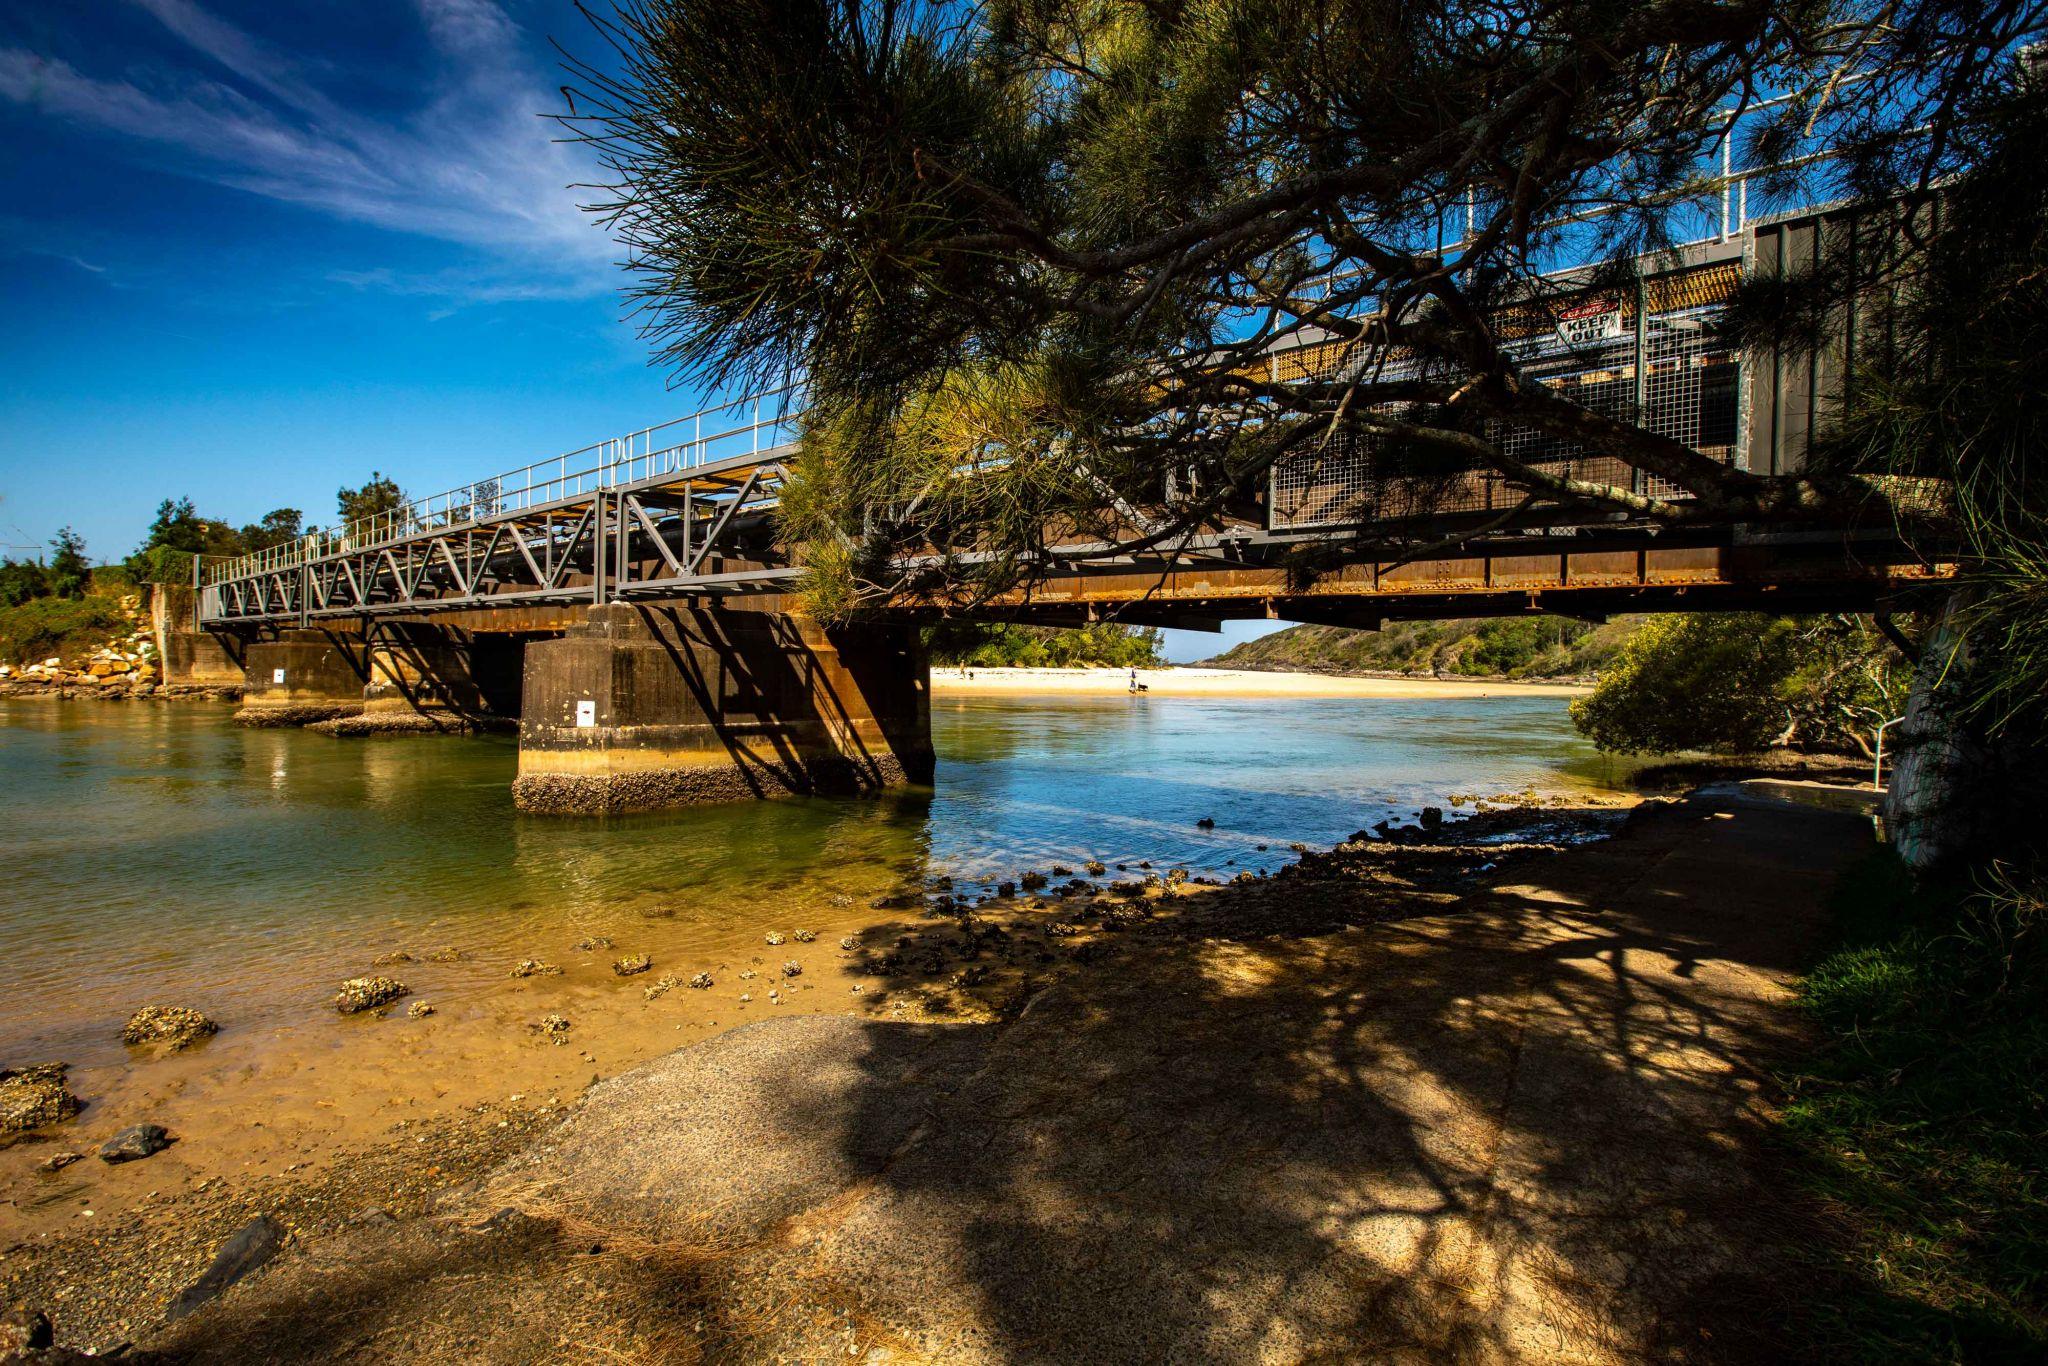 Boambee Creek, Railway Bridge, Boambee, NSW, Australia